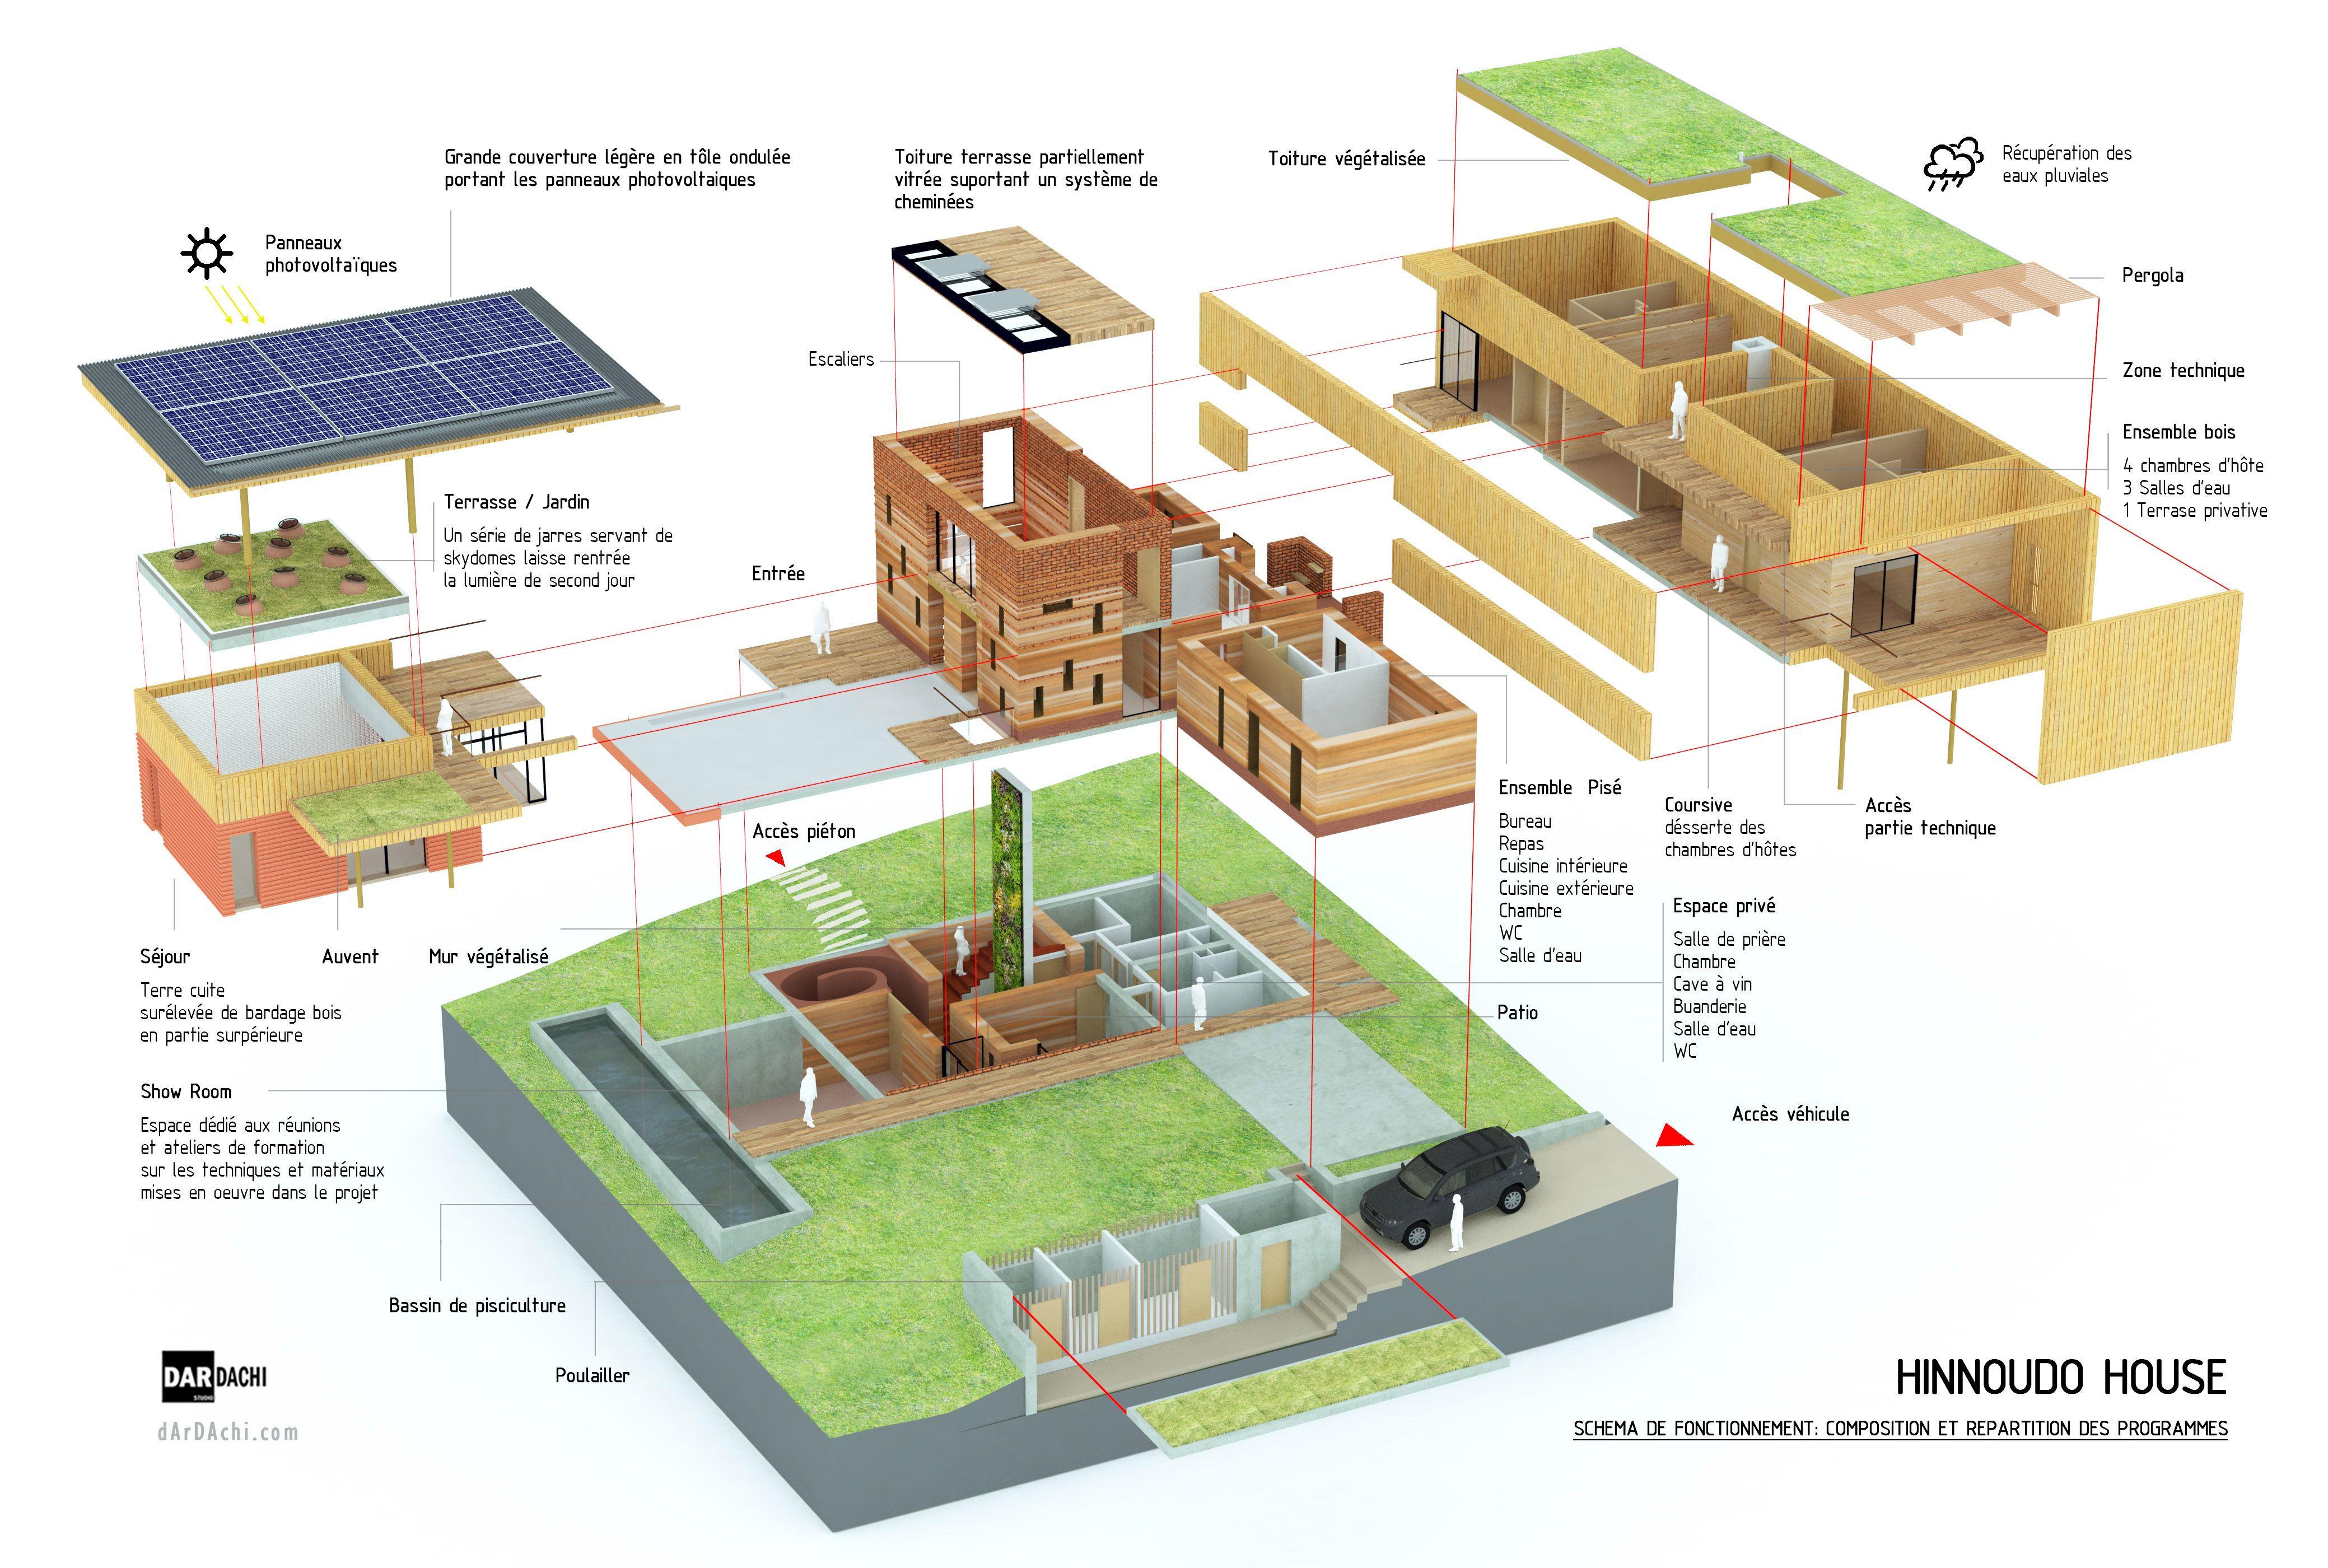 Epingle Sur Architectural Design